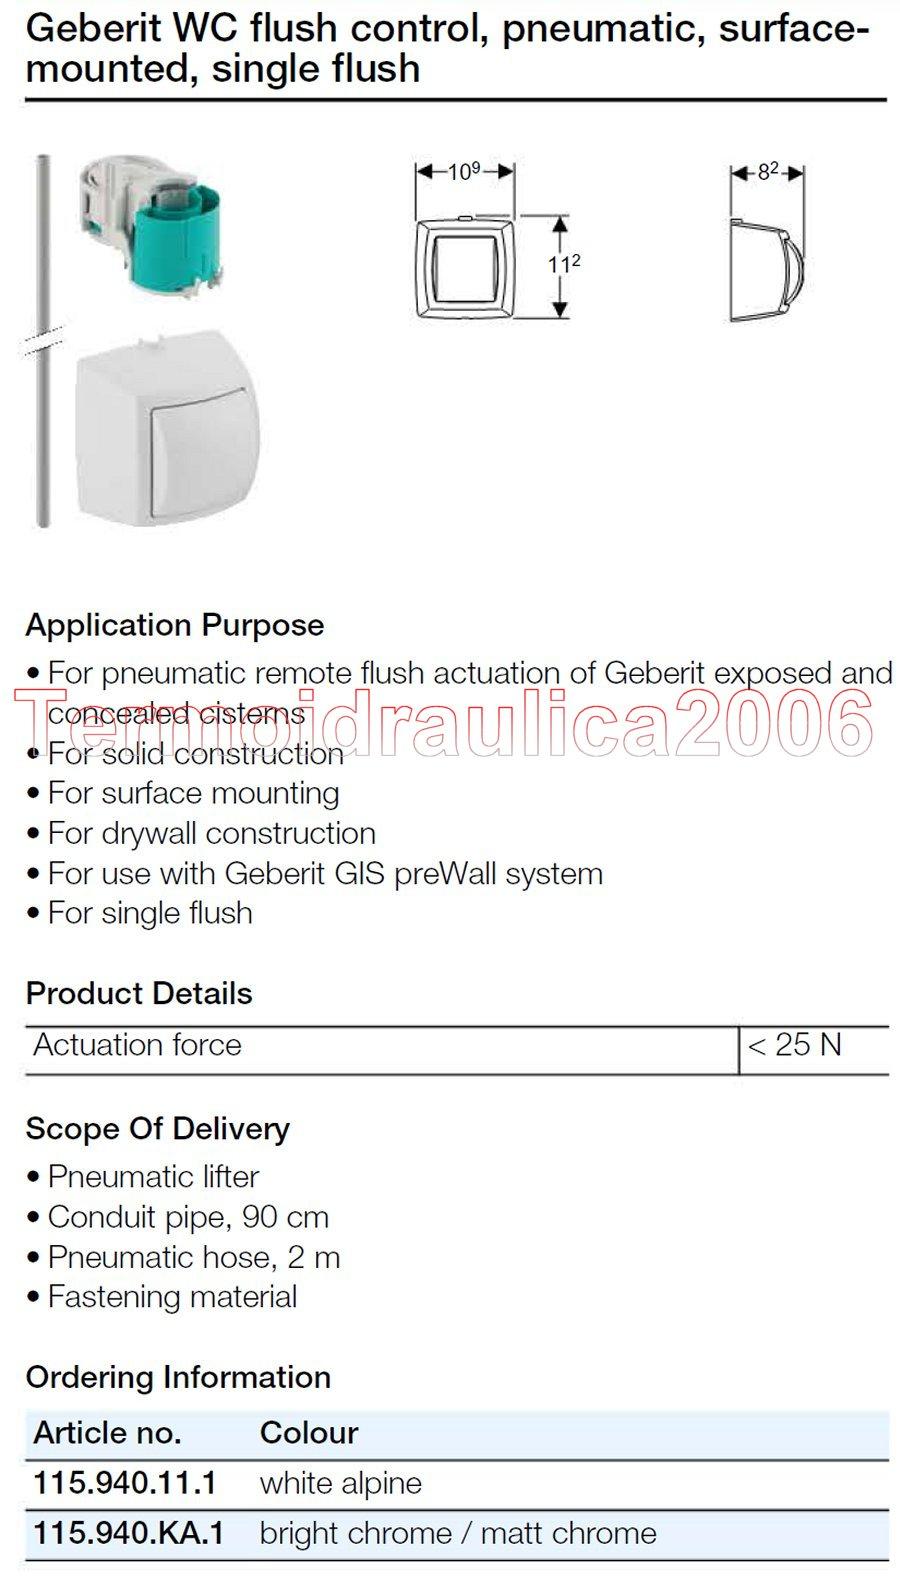 geberit wc control pneumatic surface single flush bright chr matt ebay. Black Bedroom Furniture Sets. Home Design Ideas